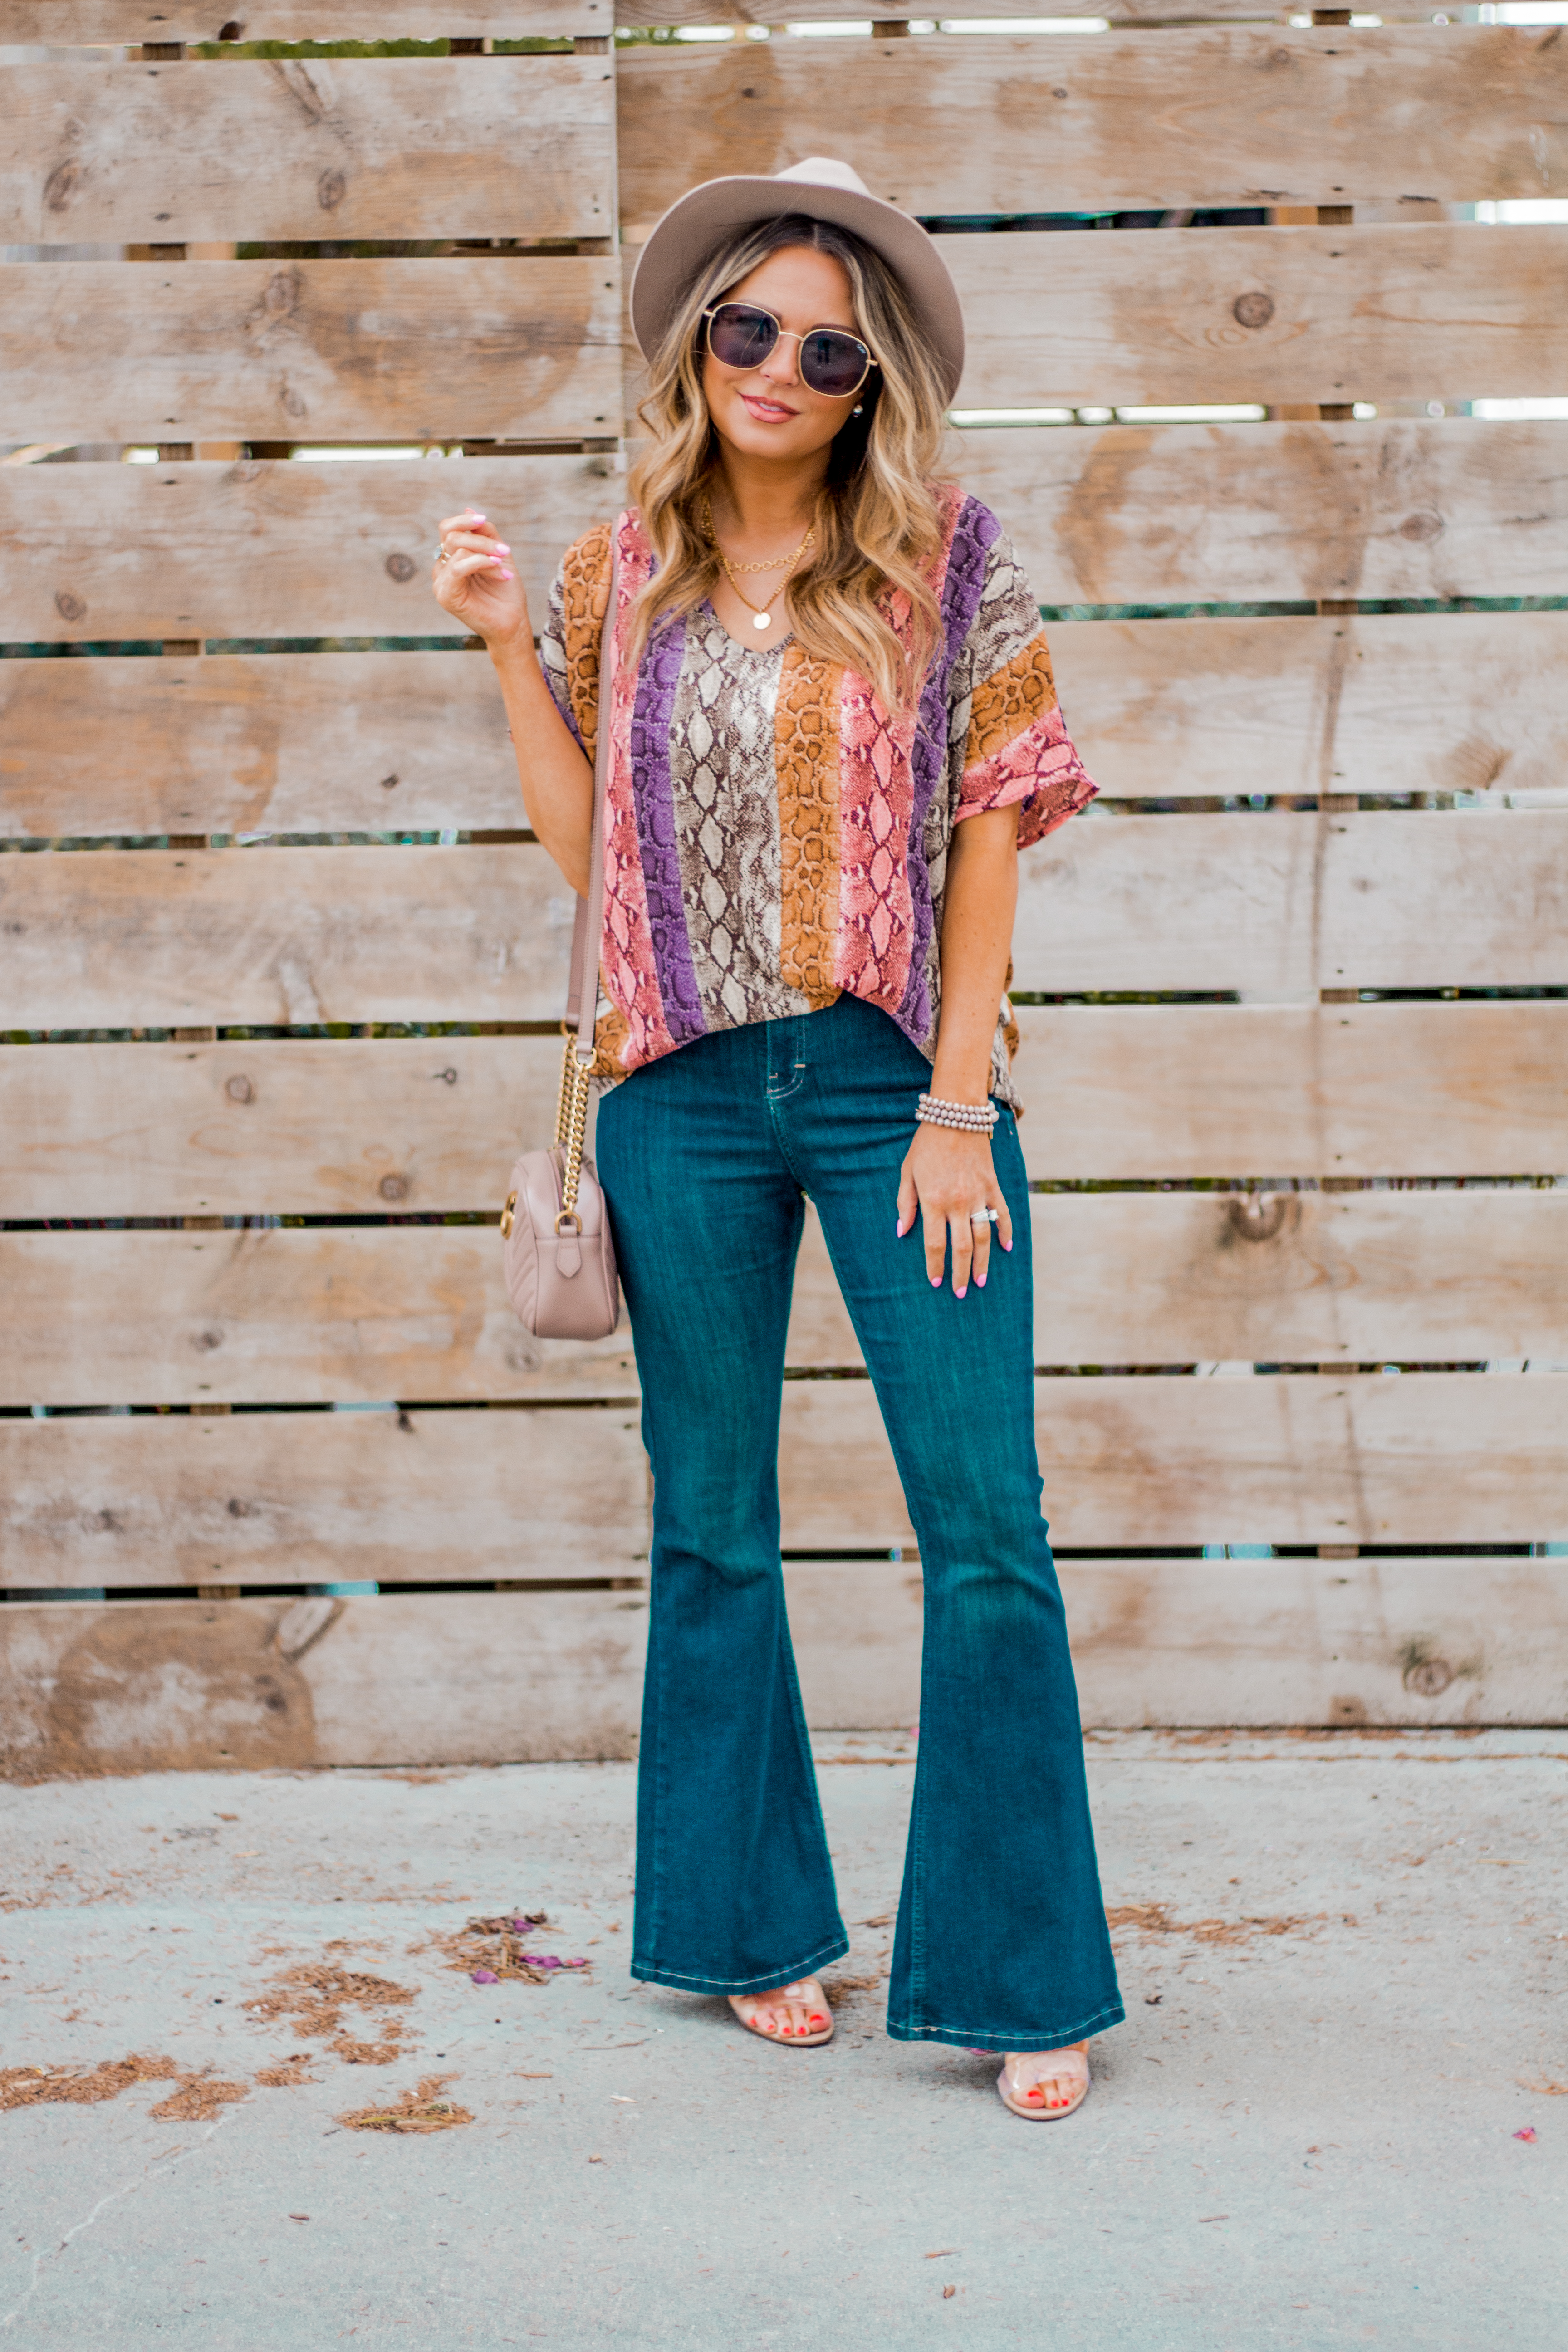 Women's Fashion - Snakeskin Print - Snakeskin Trend - Spring Fashion Trend - Omaha Fashion Blog - Boho Vibes - Flare Jeans - 1